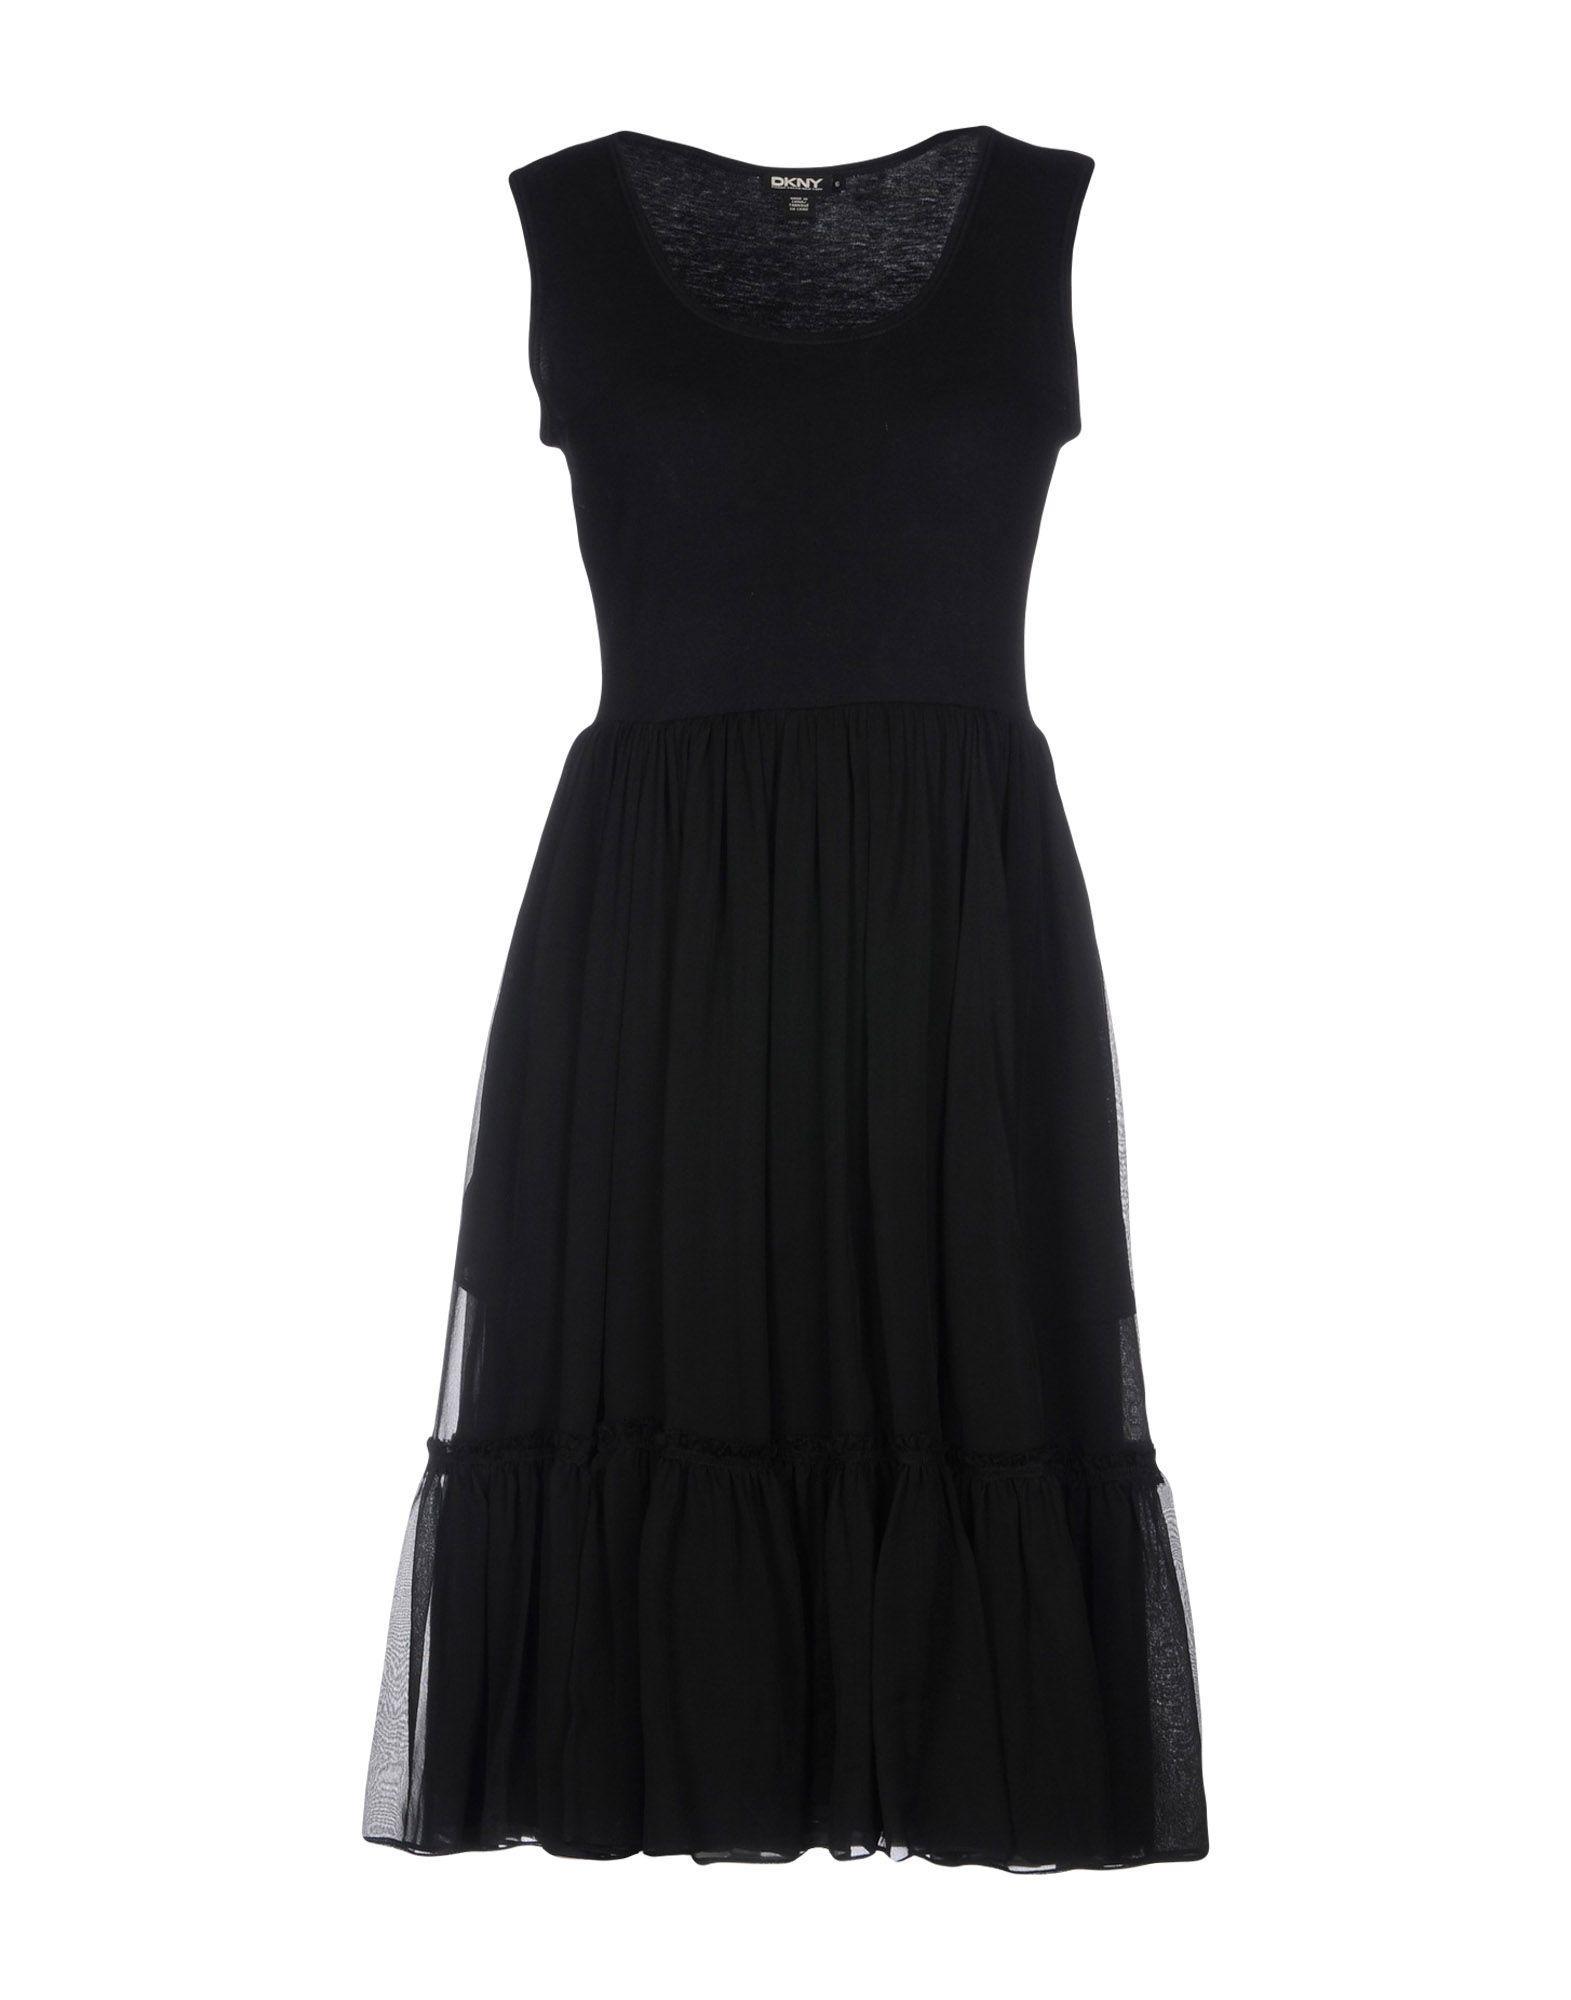 Dkny Knee-length Dress In Black